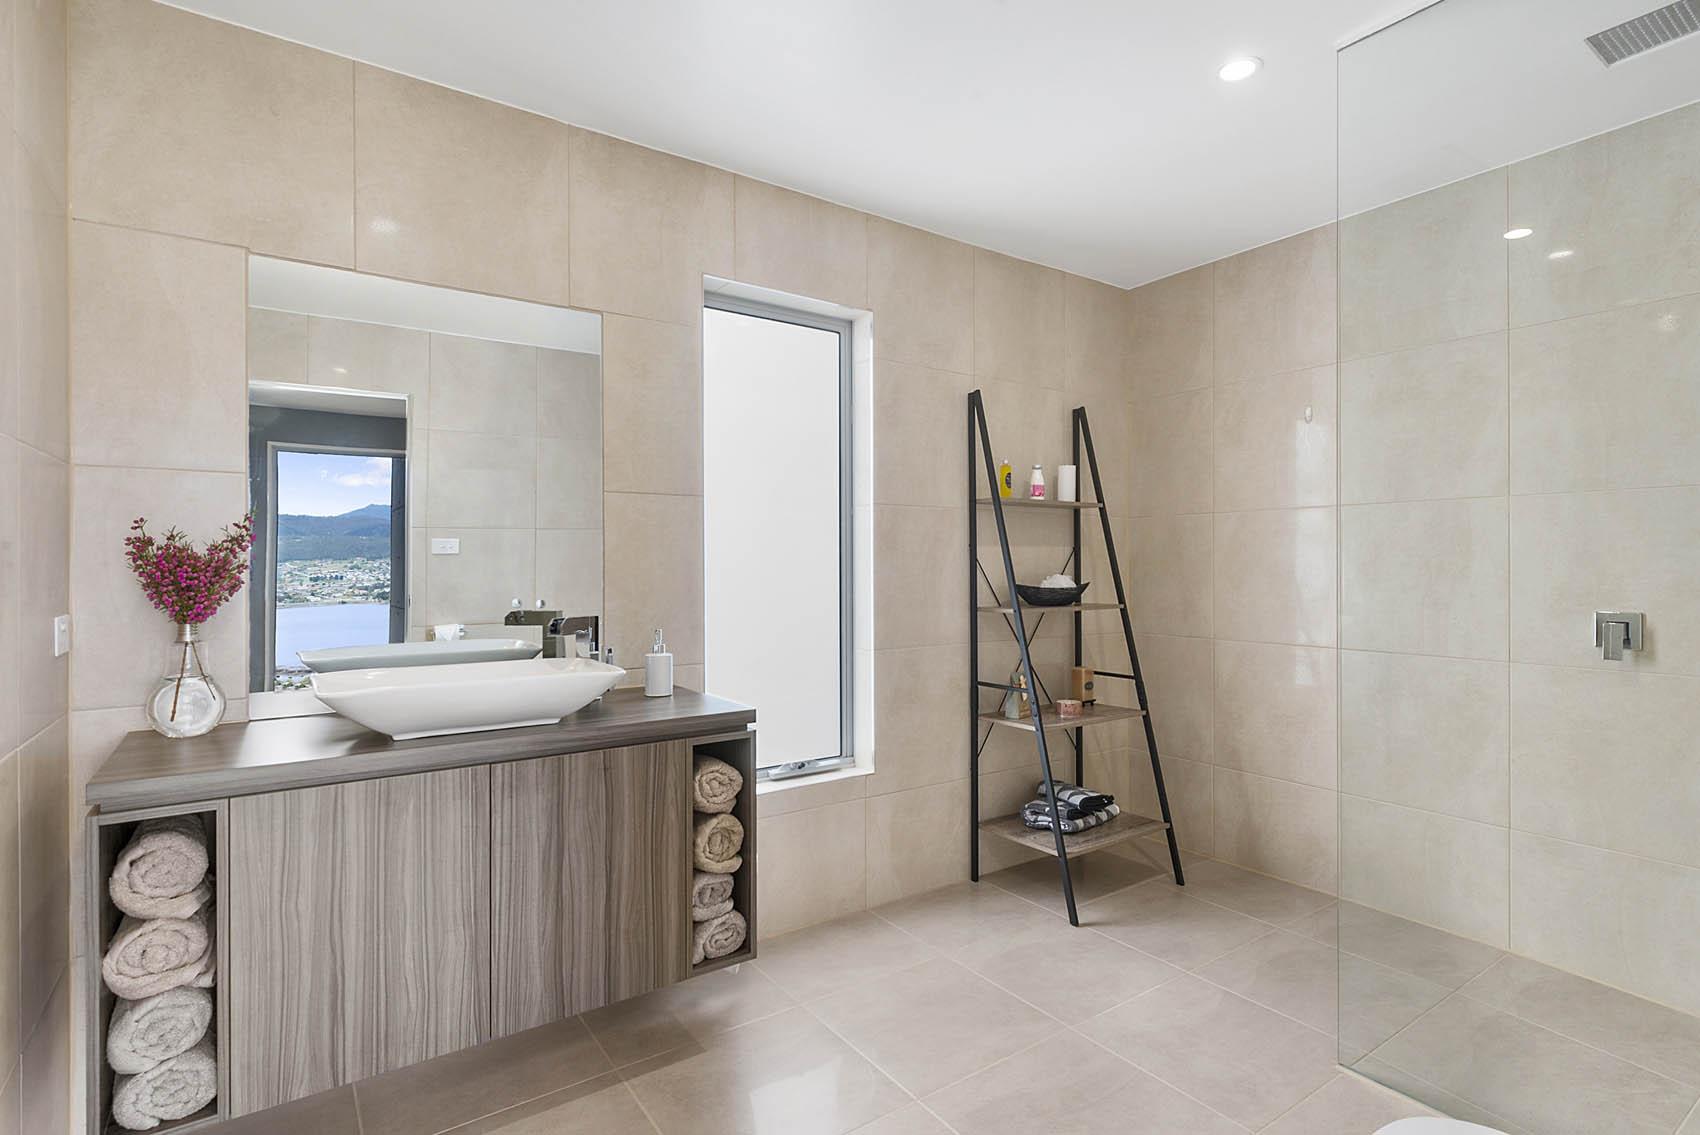 hobart-builders-321-build-tasmania-new-home-renovations-2